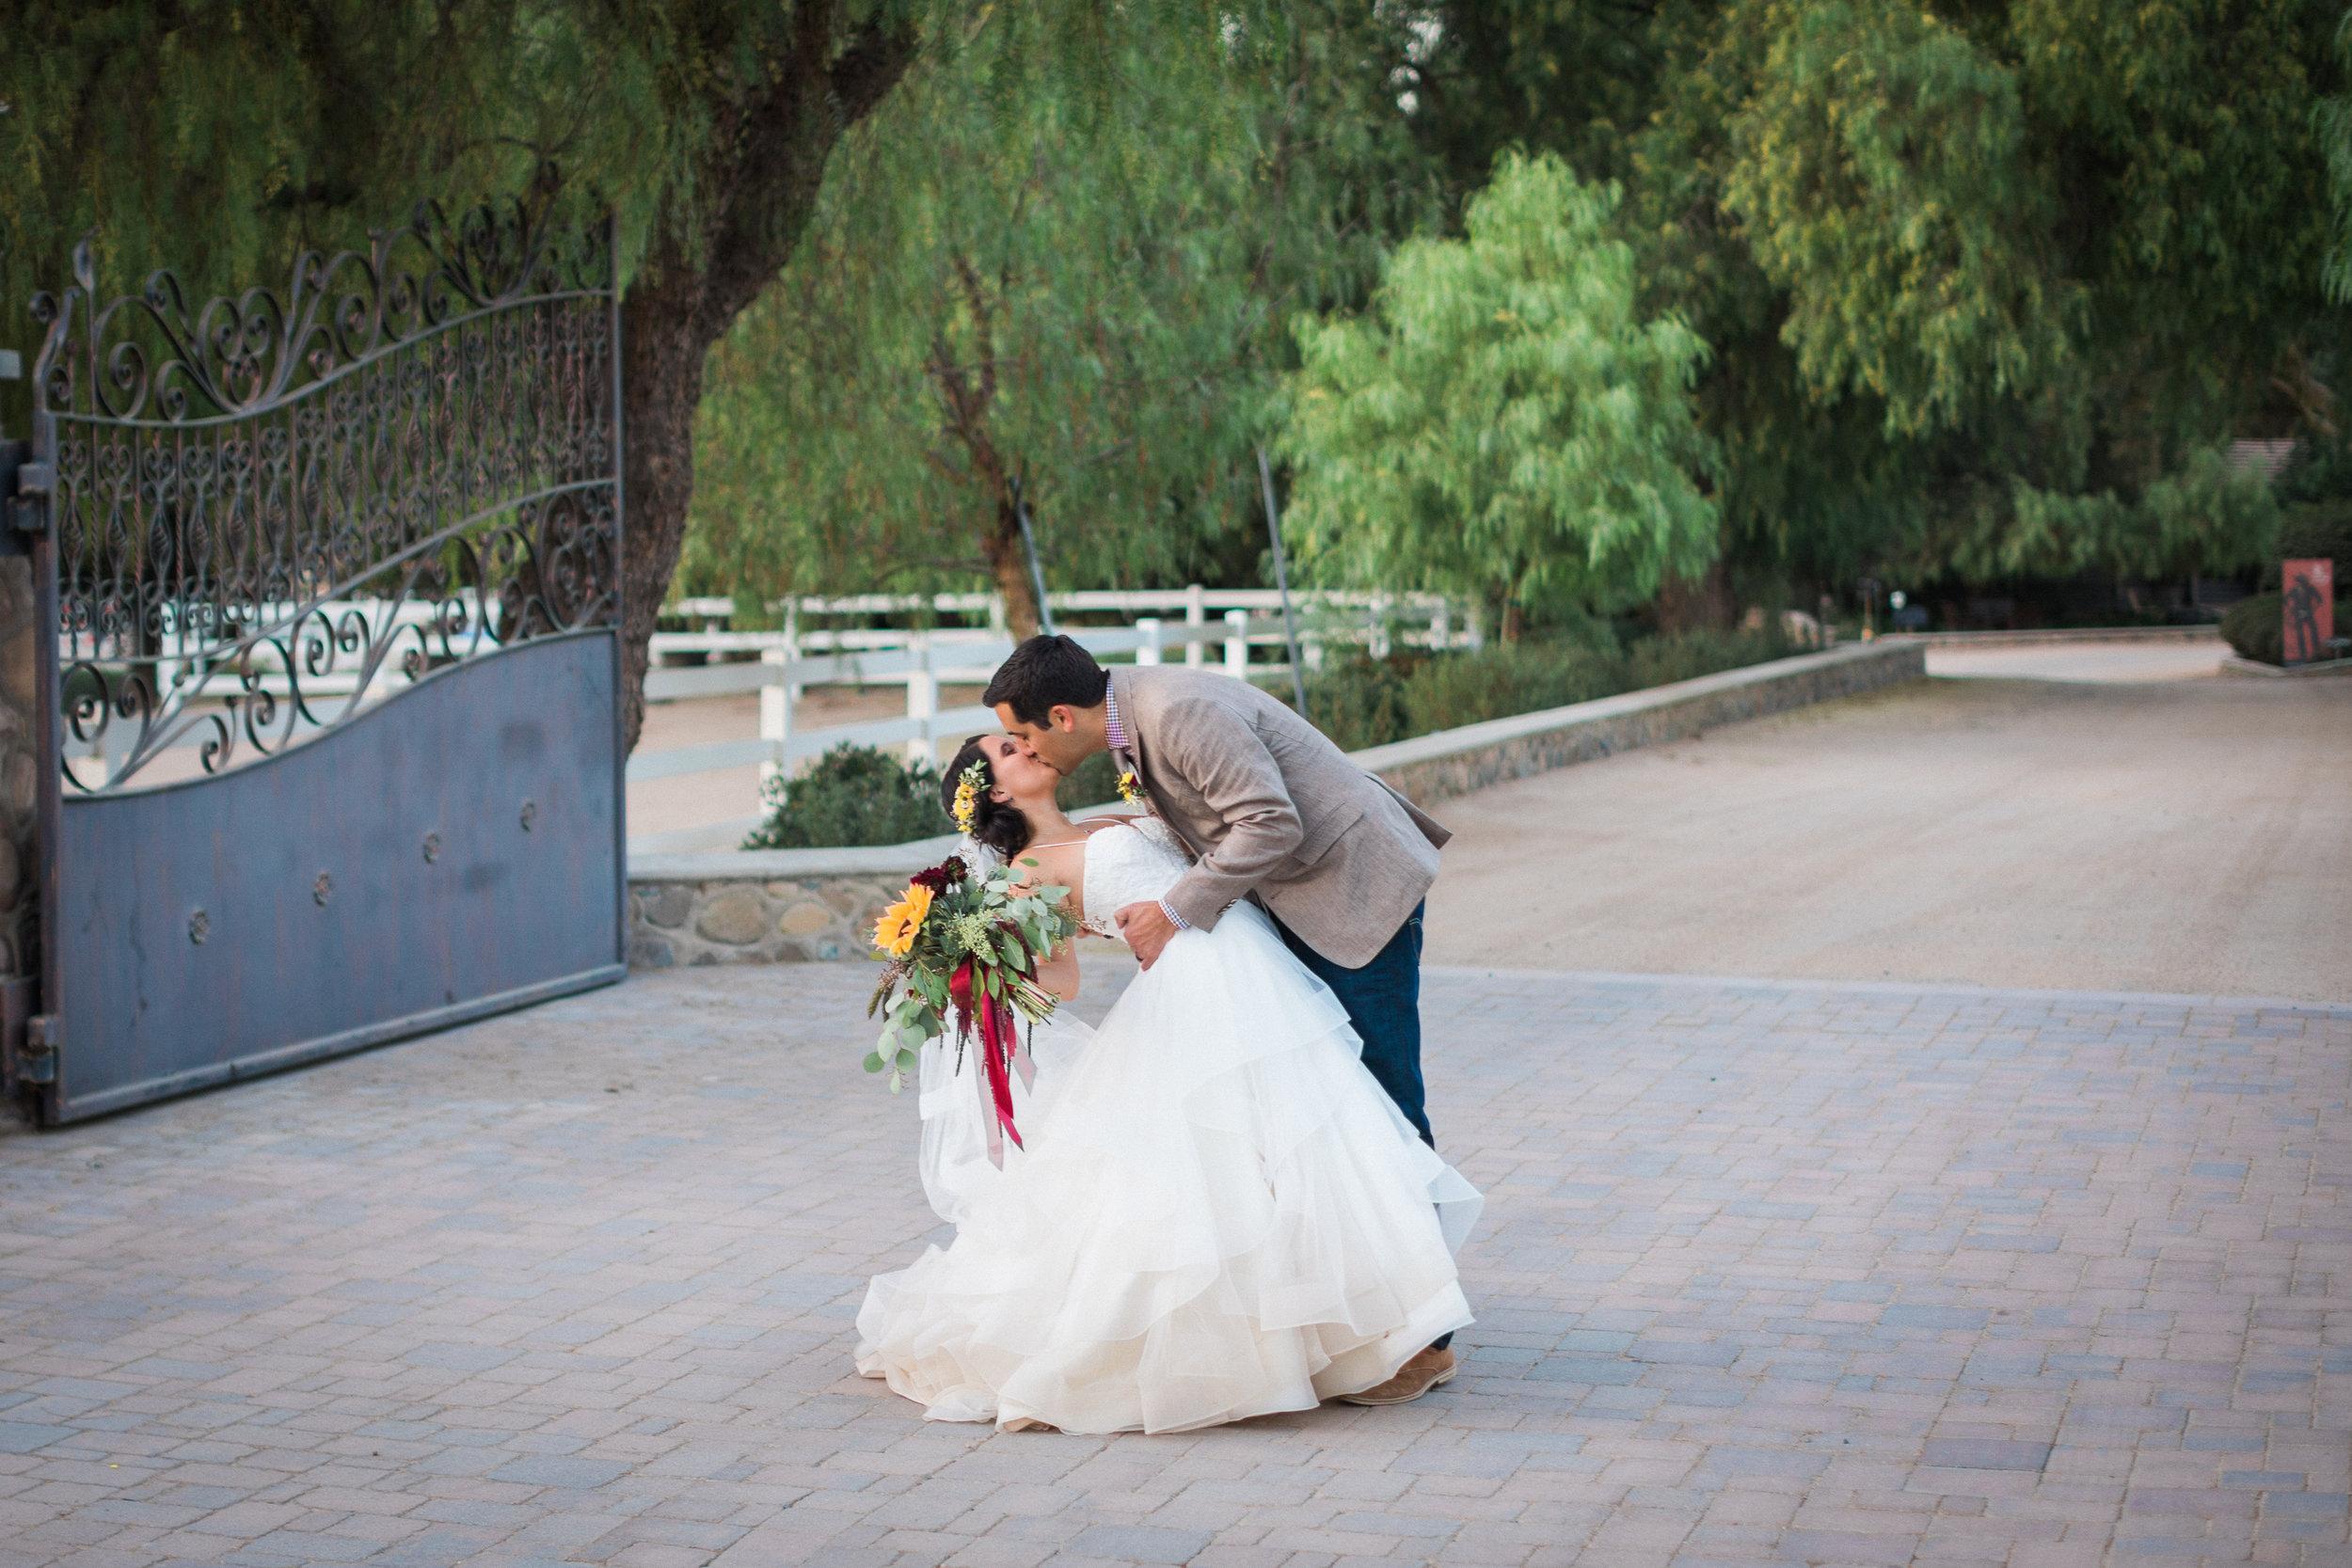 Johnson Wedding_Bridal Party + Romantics-103.jpg